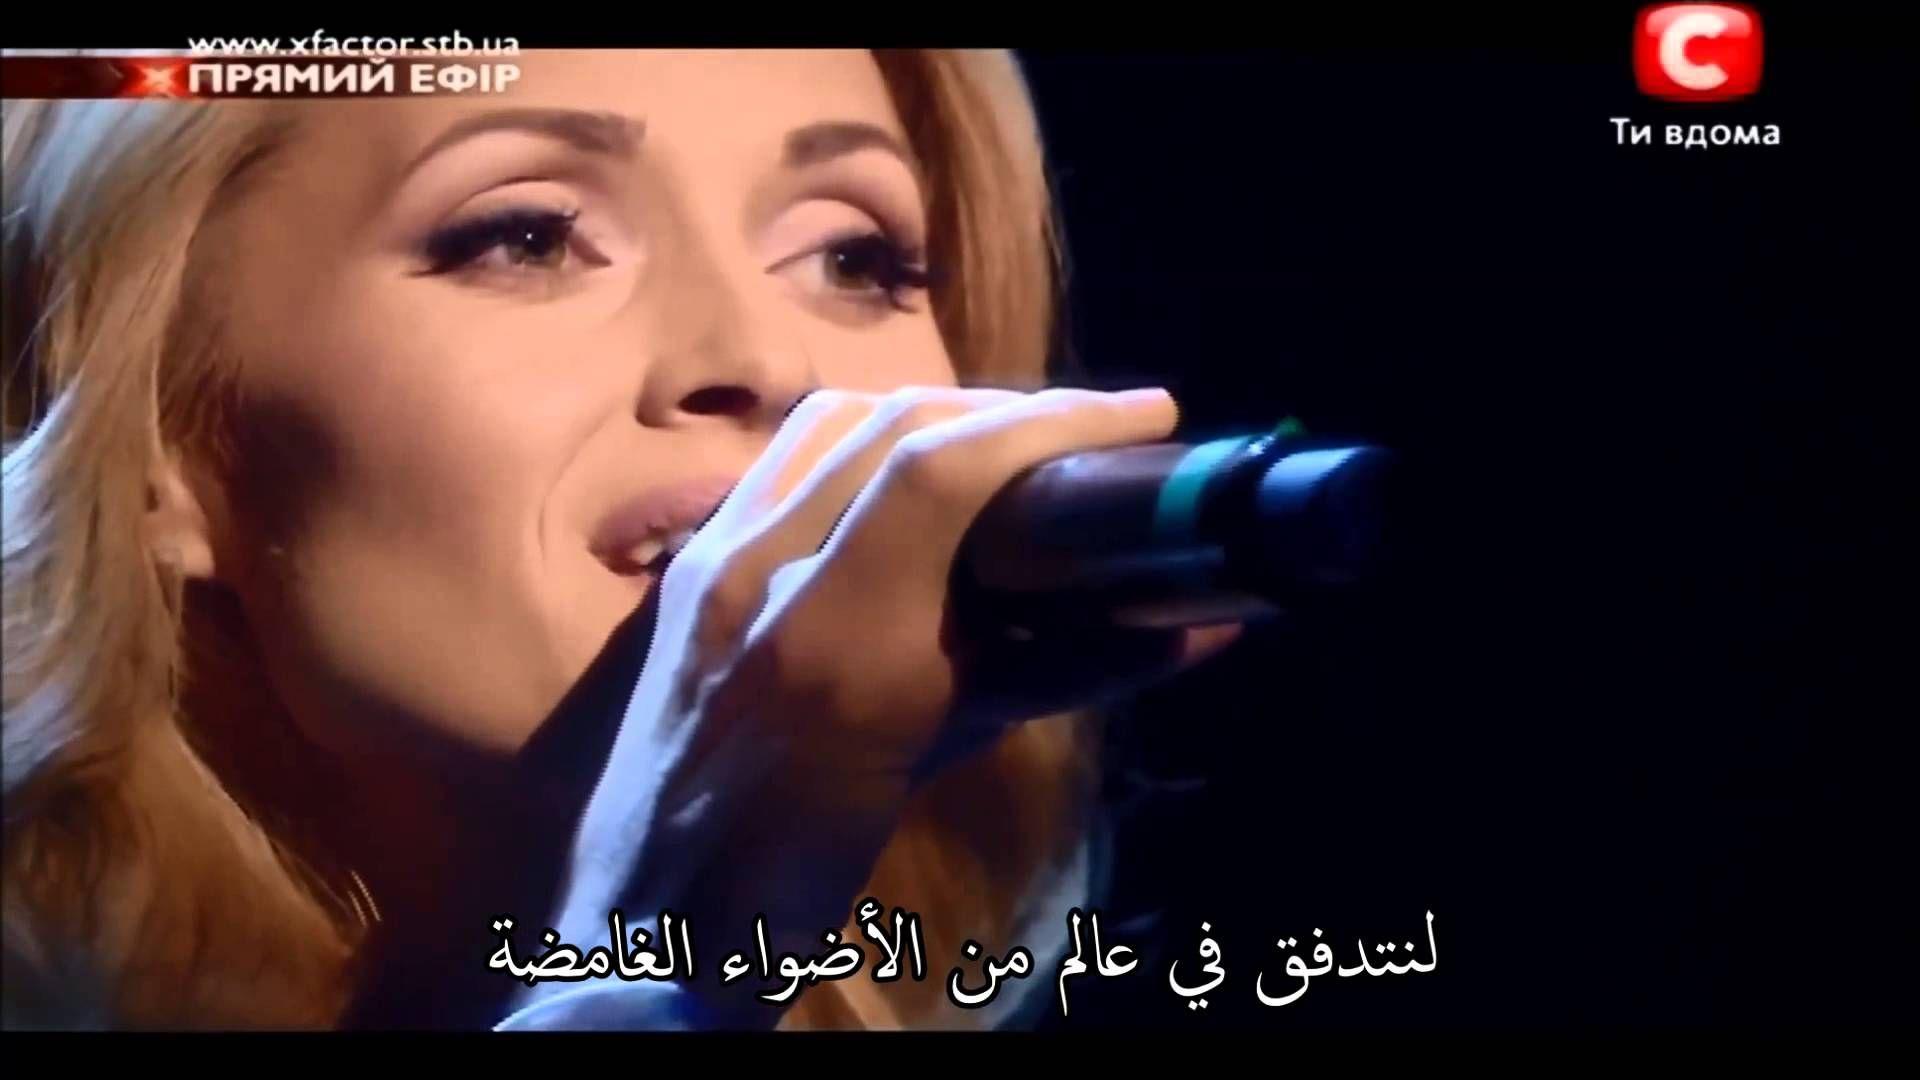 Aida Nikolajchuk Aida Nikolaichuk عايدة نيكولاي شوك Lullaby التهويدة Arabic Sub Hd1080p Youtube Lullabies My Favorite Music Songs